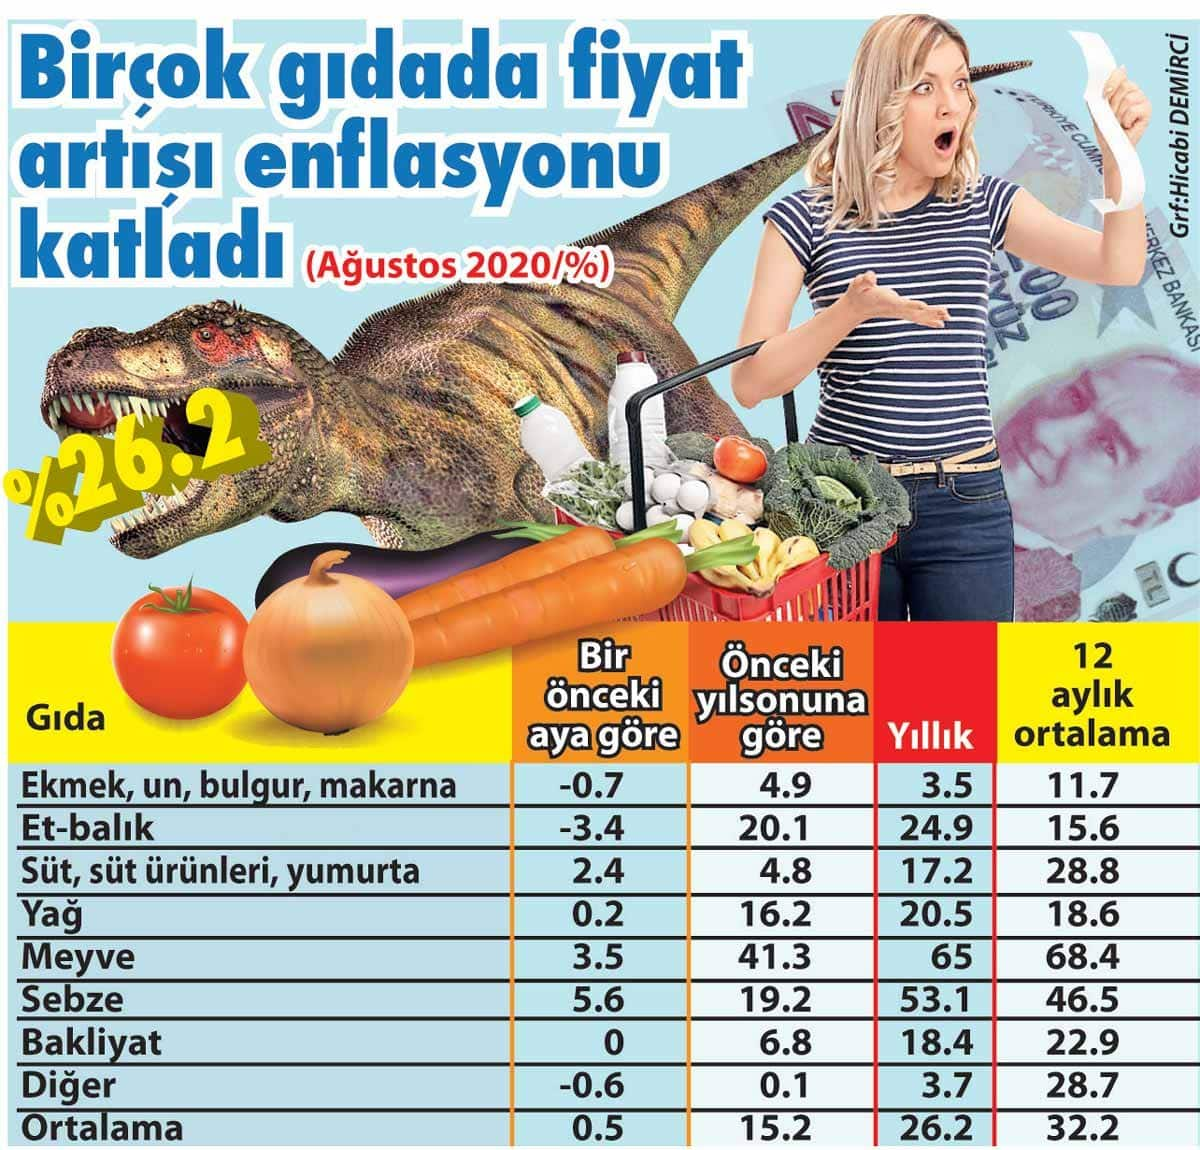 gıda fiyatları